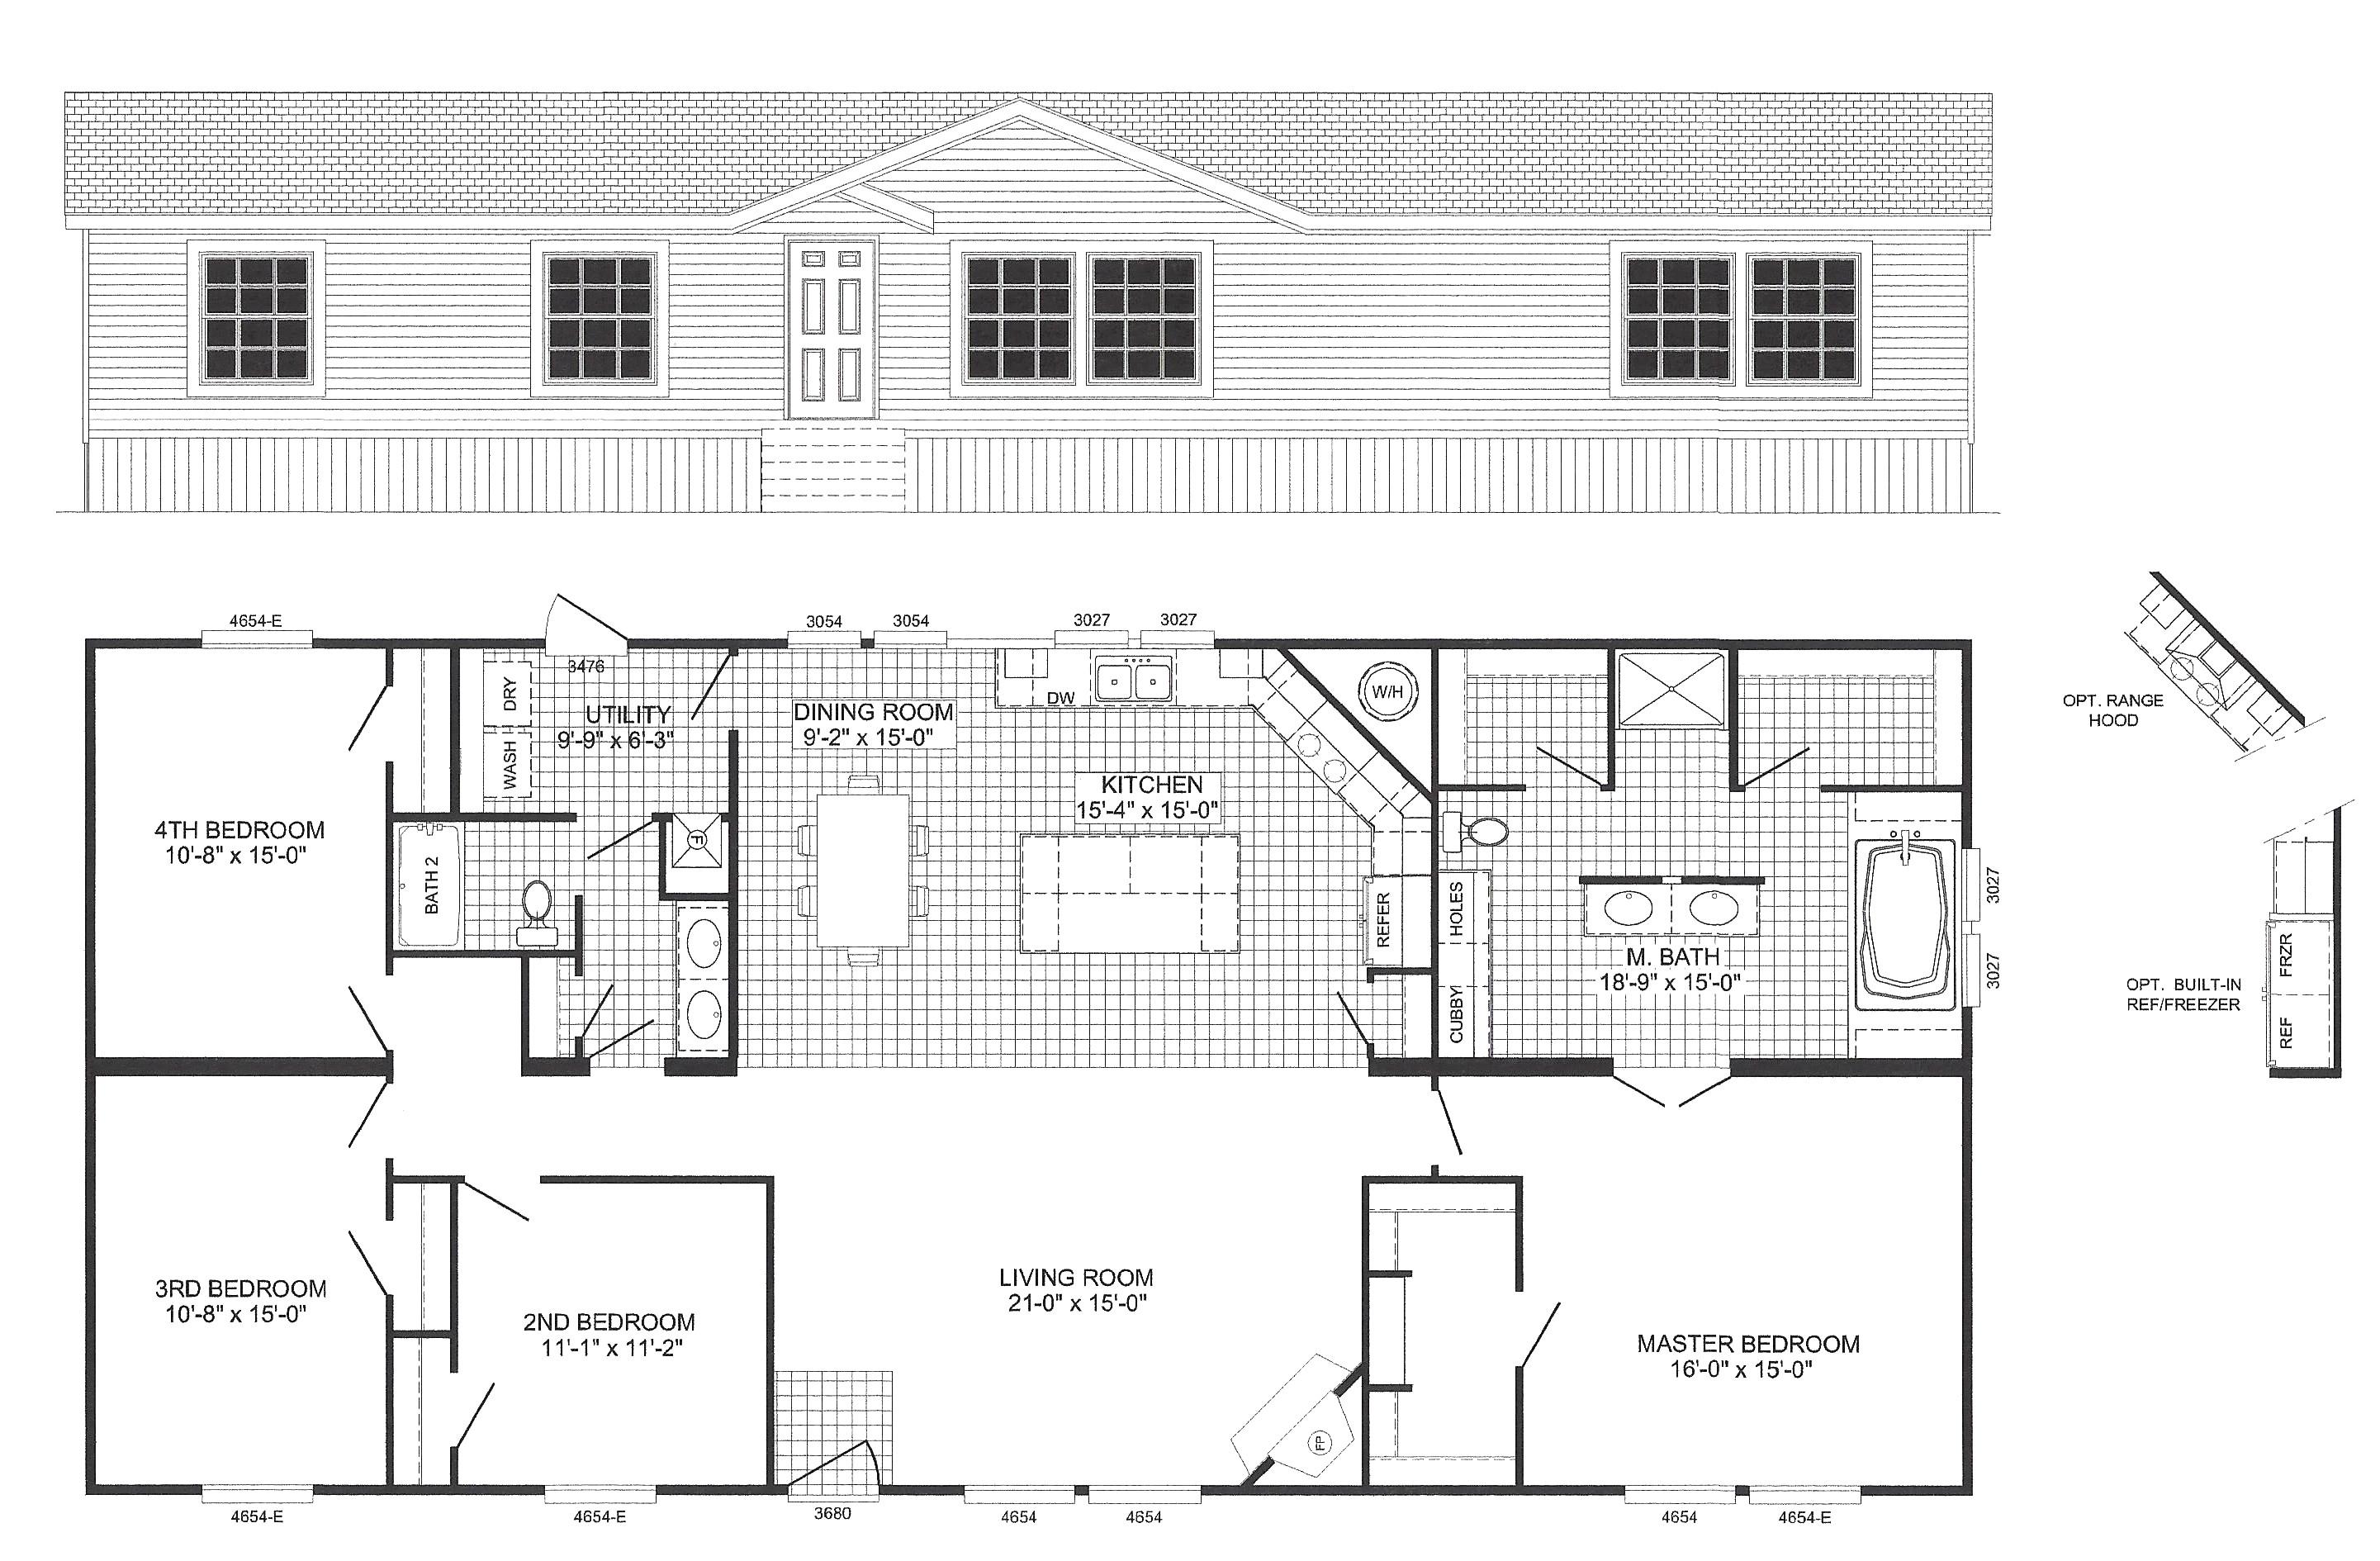 scotbilt homes floor plans new 2 bedroom single wide mobile homes scotbilt home floor plans